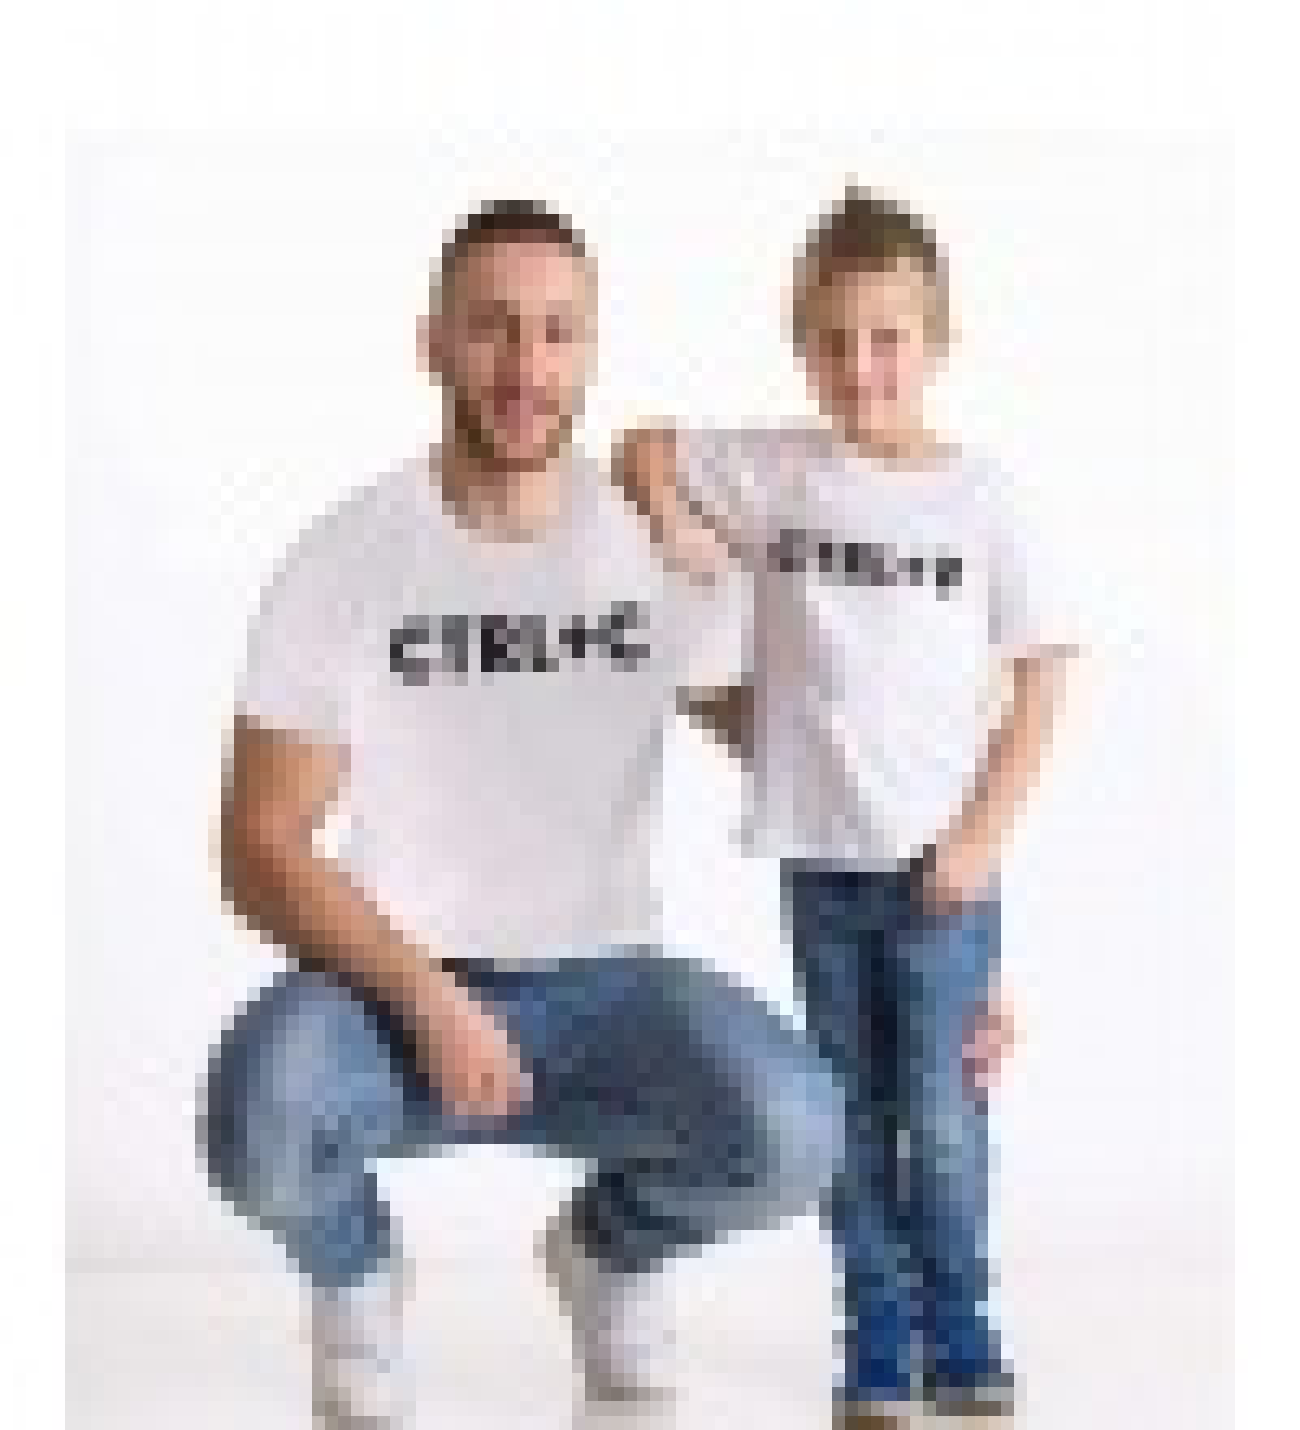 Tshirthane - Ctrl+c,Ctrl+v Baba Oğul Tshirt Beyaz Tişört